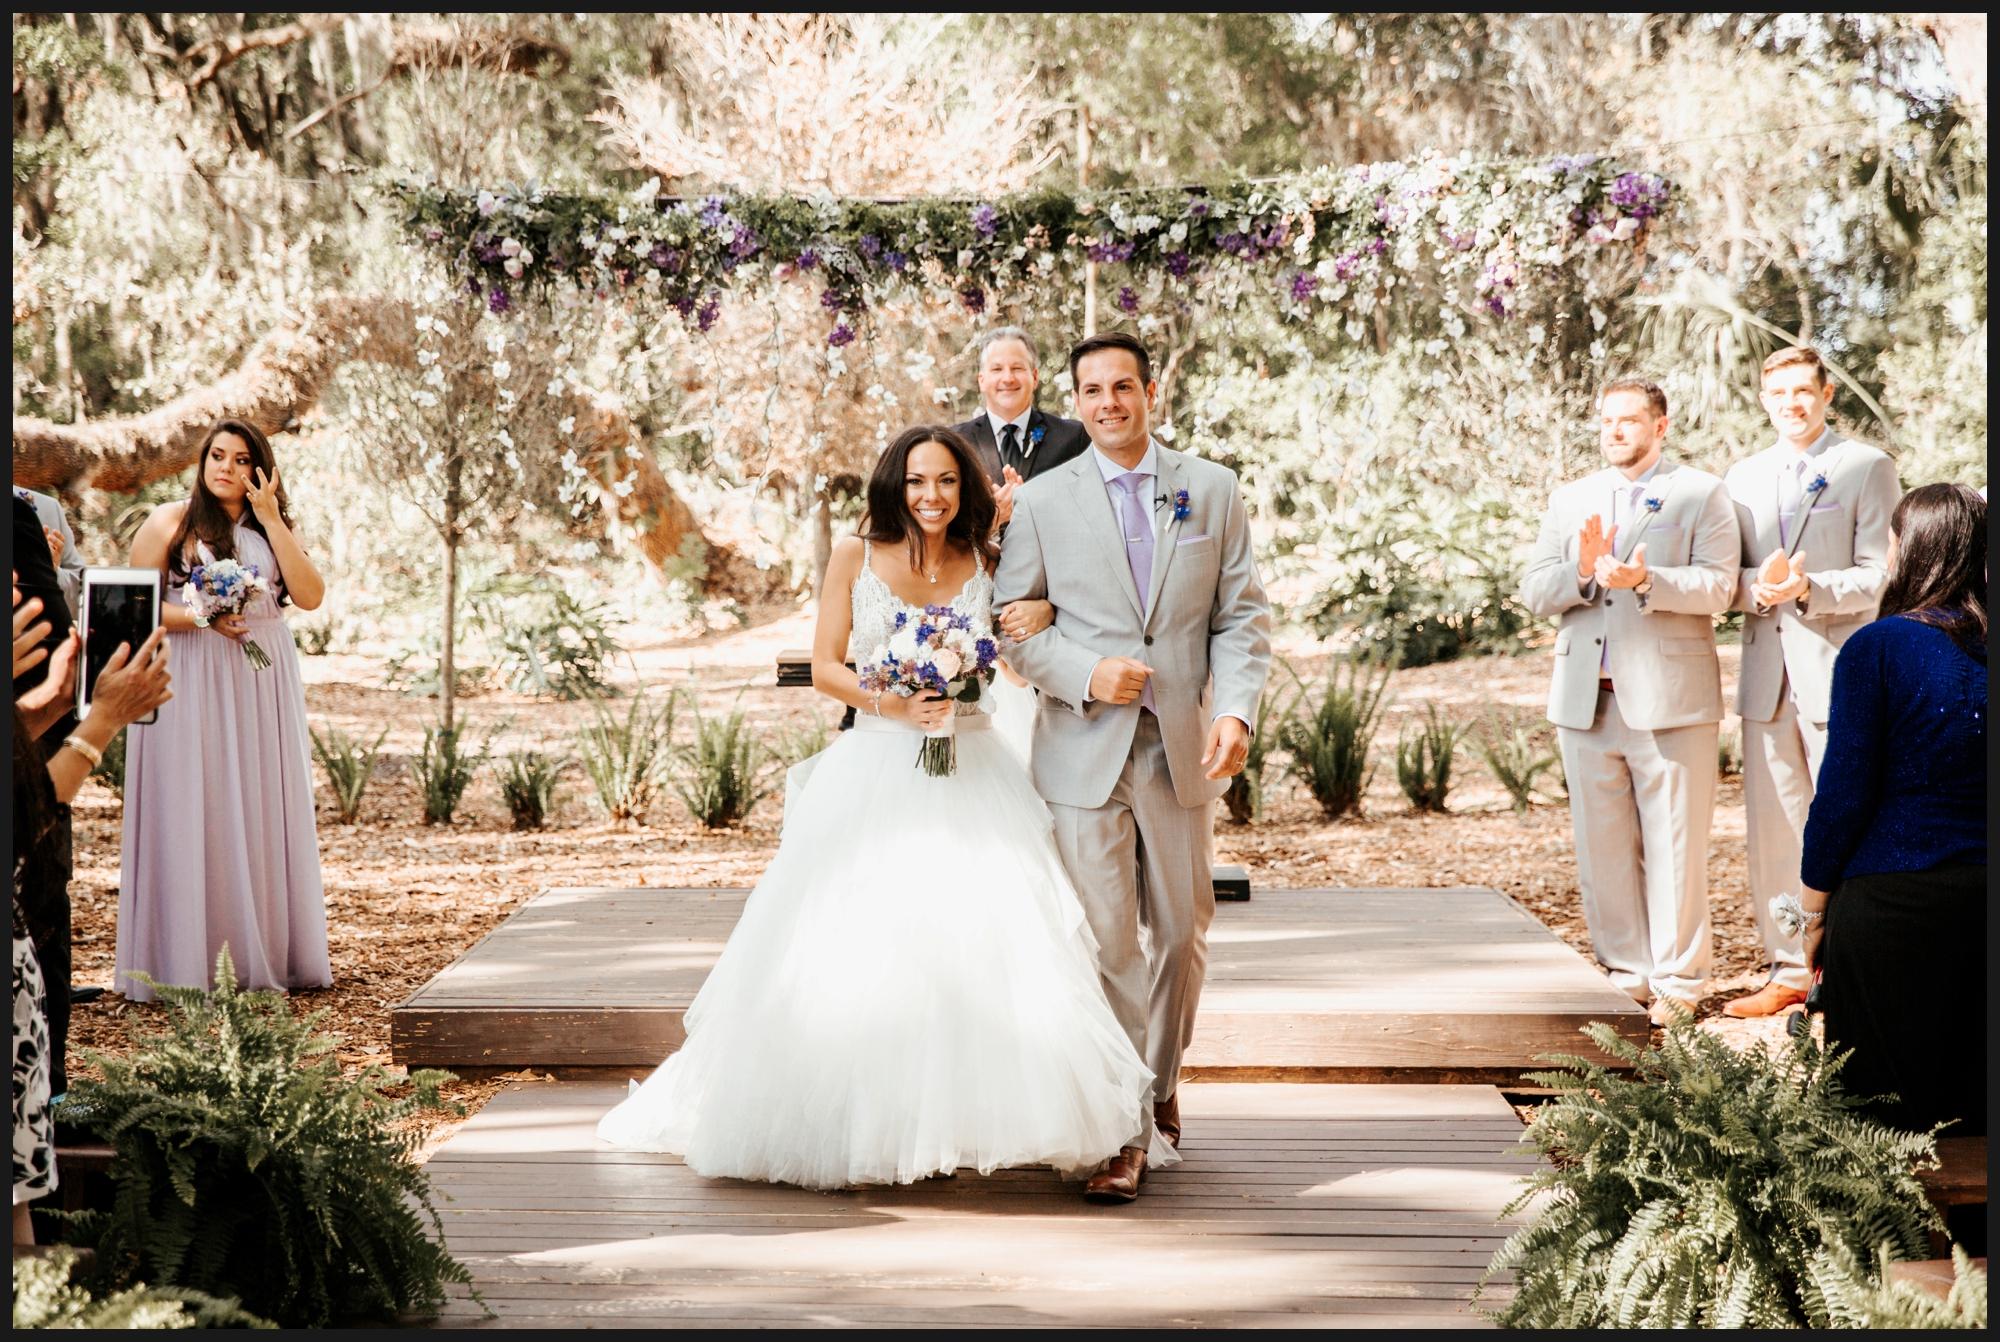 Orlando-Wedding-Photographer-destination-wedding-photographer-florida-wedding-photographer-bohemian-wedding-photographer_1616.jpg